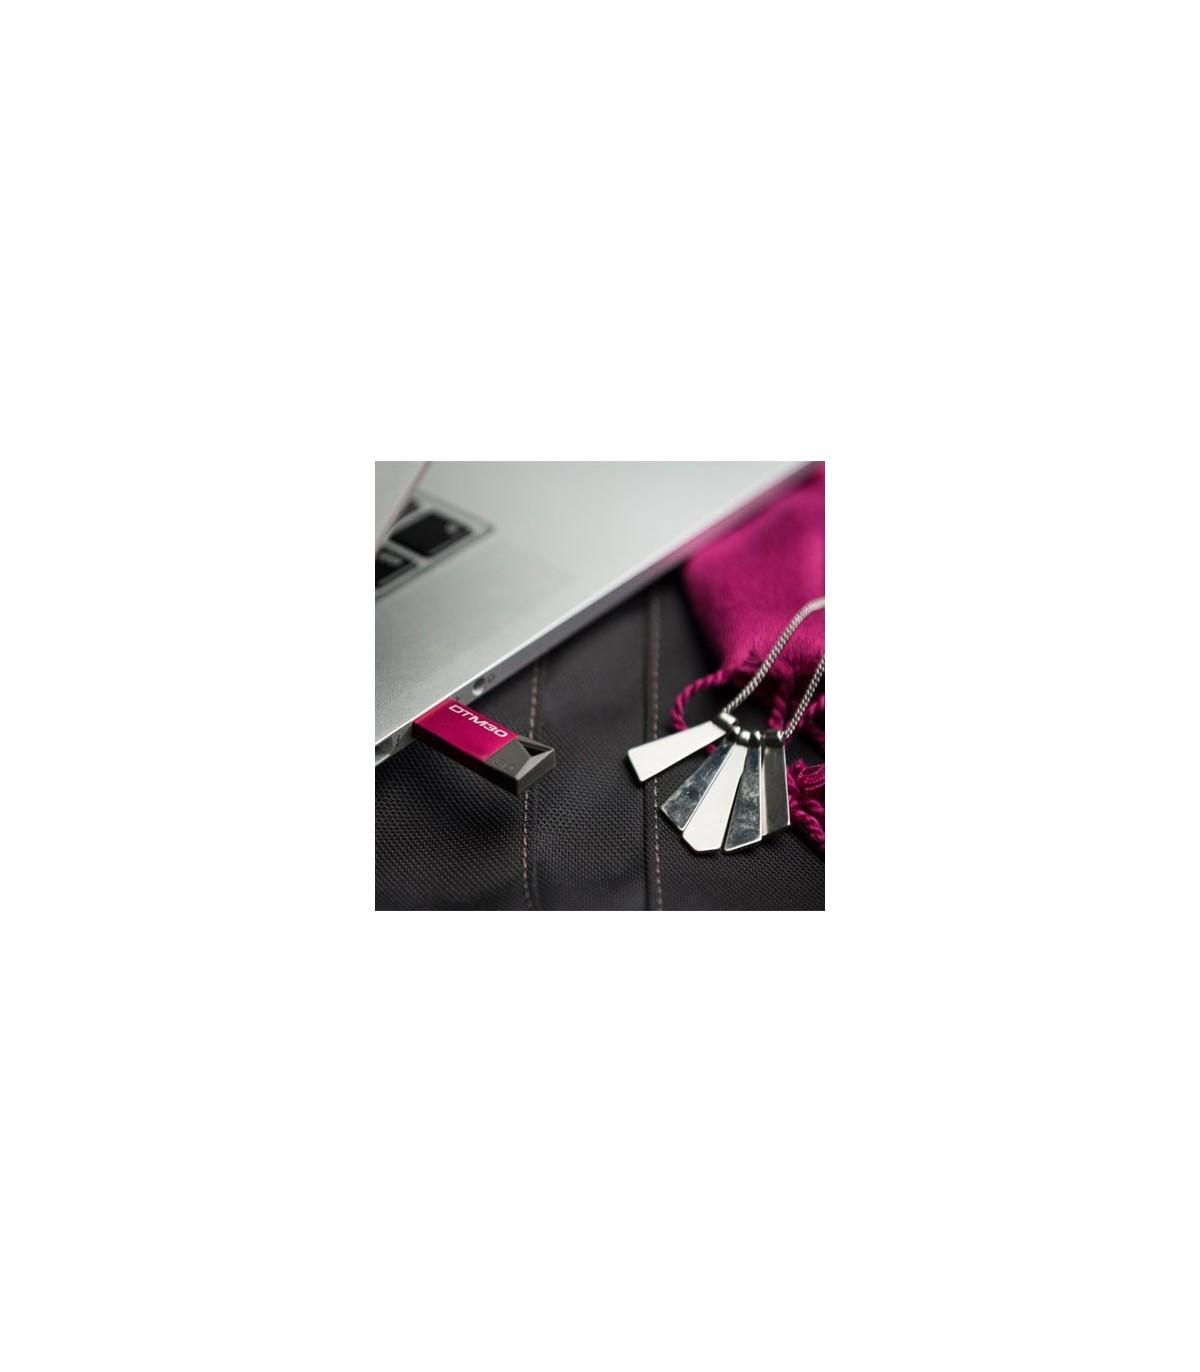 فلش مموری کینگستون 32 گیگابایت Mini 3.0 DTM30